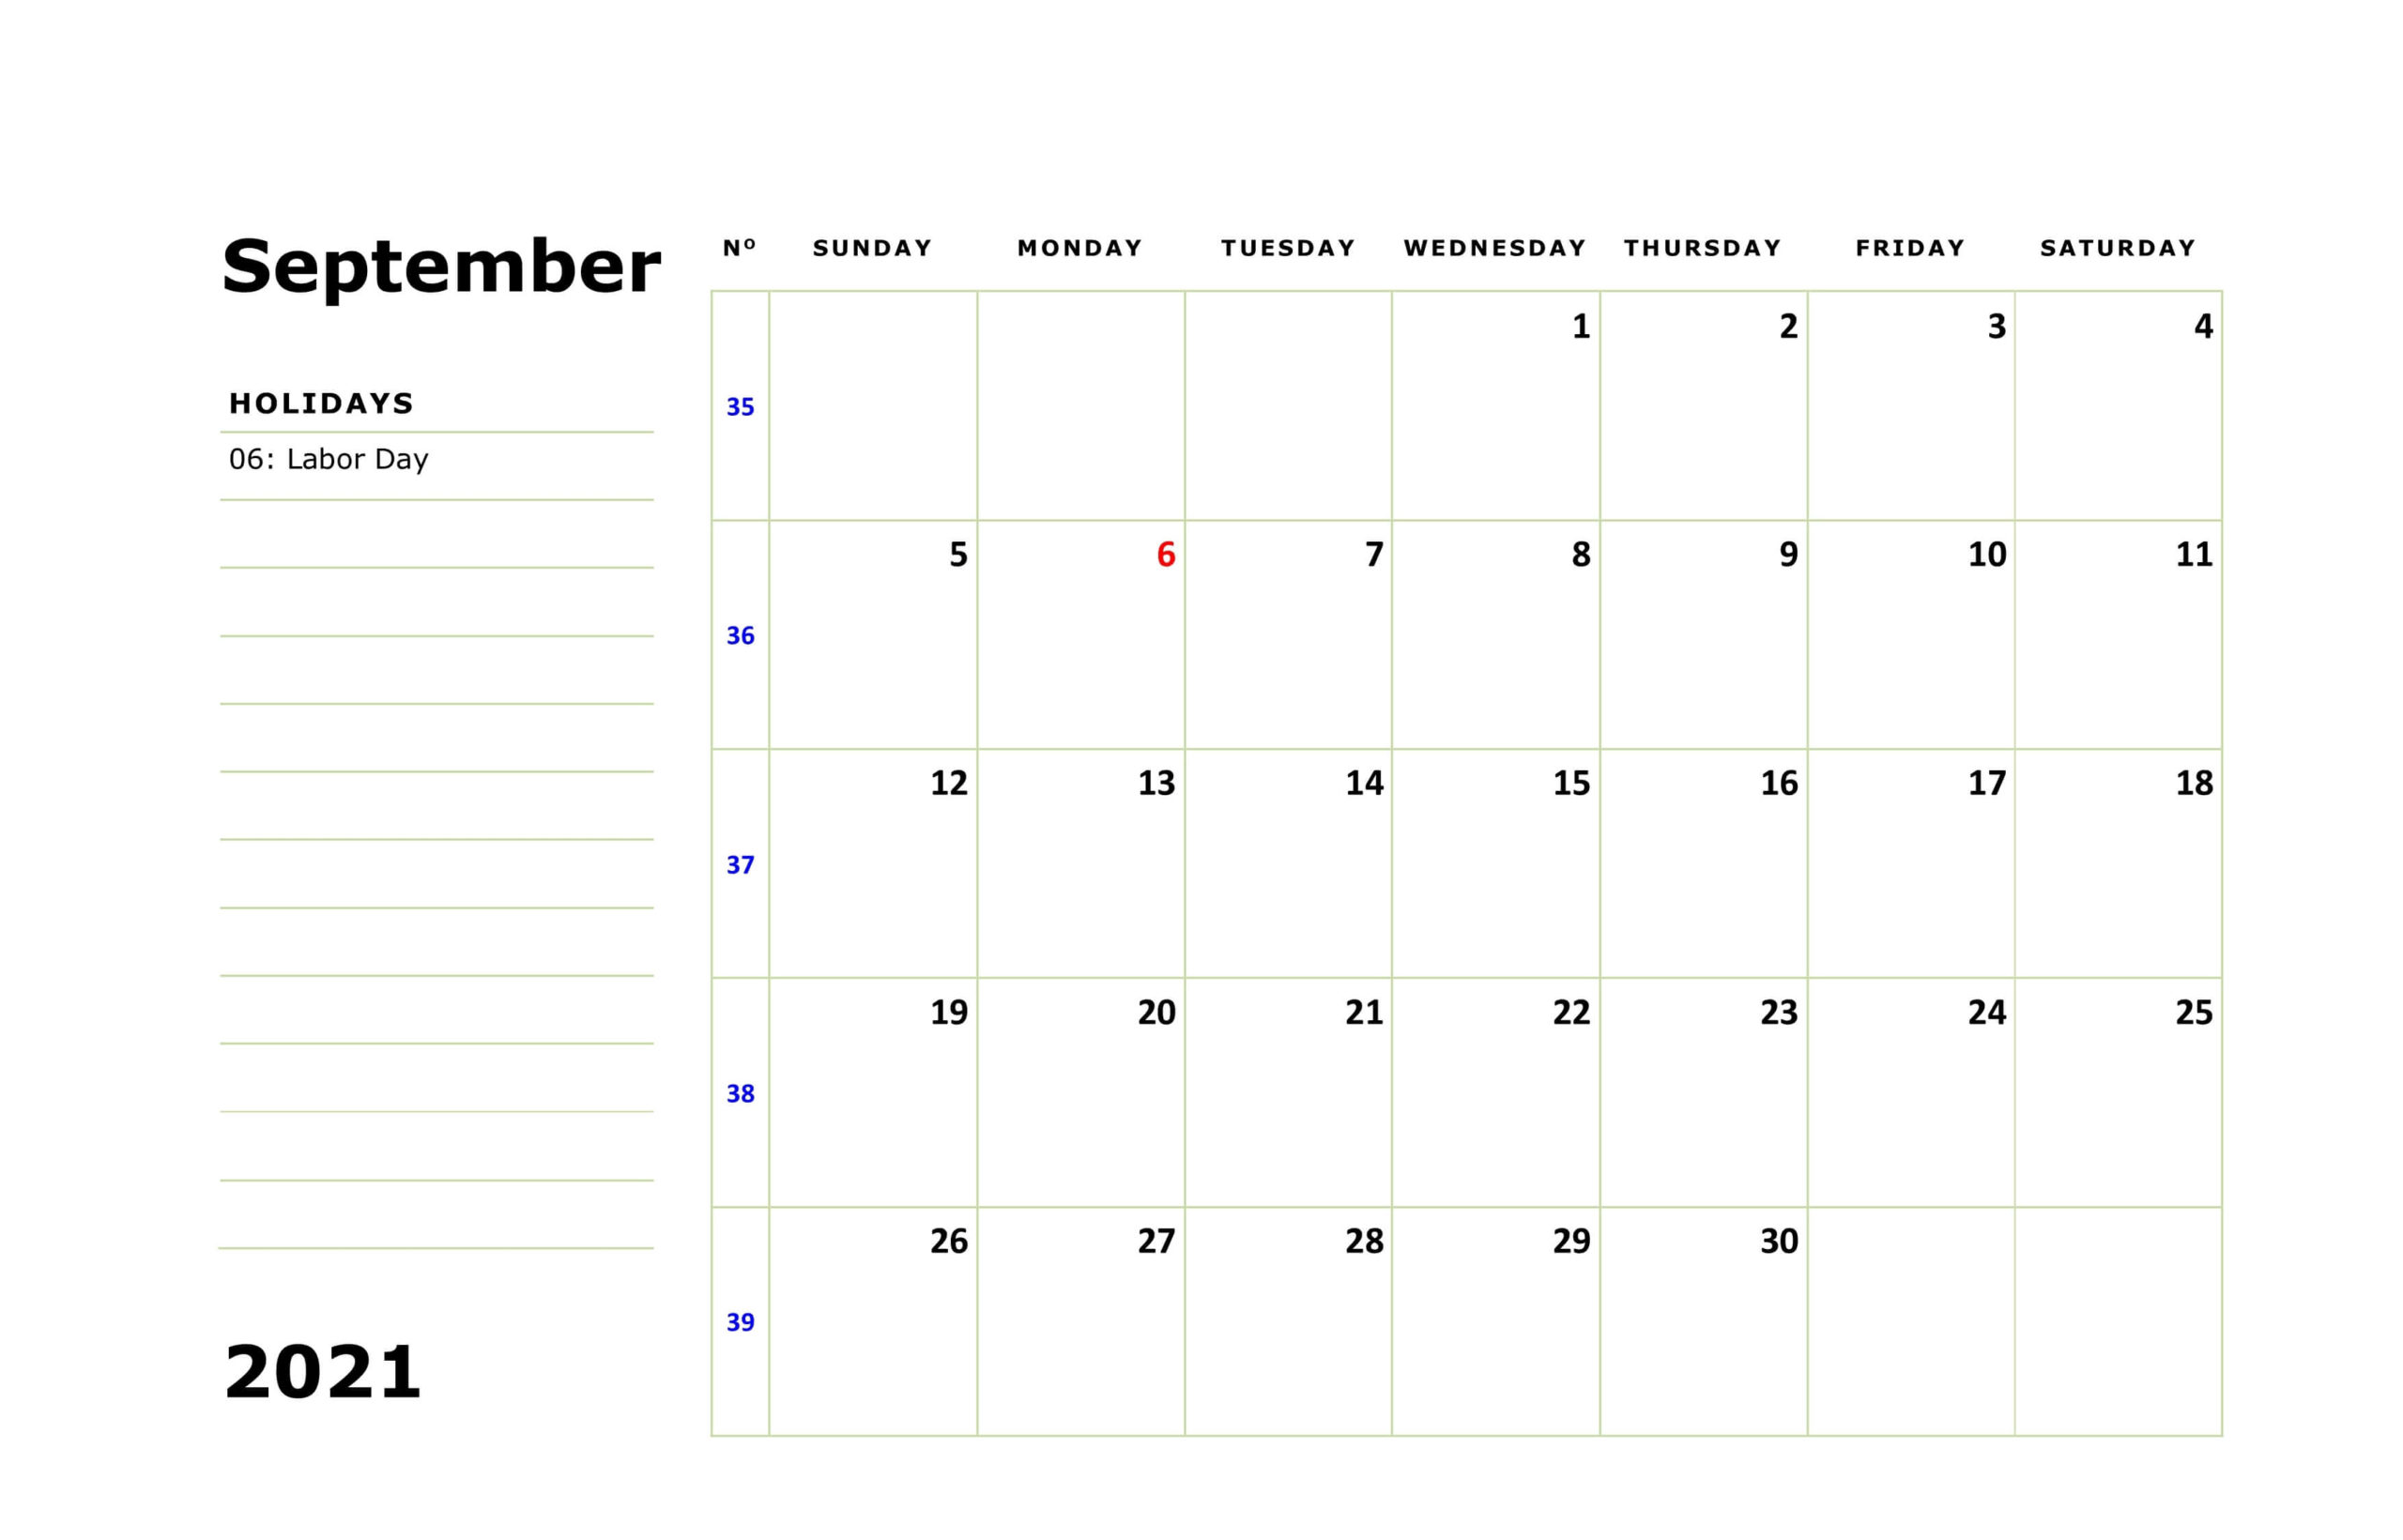 September 2021 Holidays Calendar